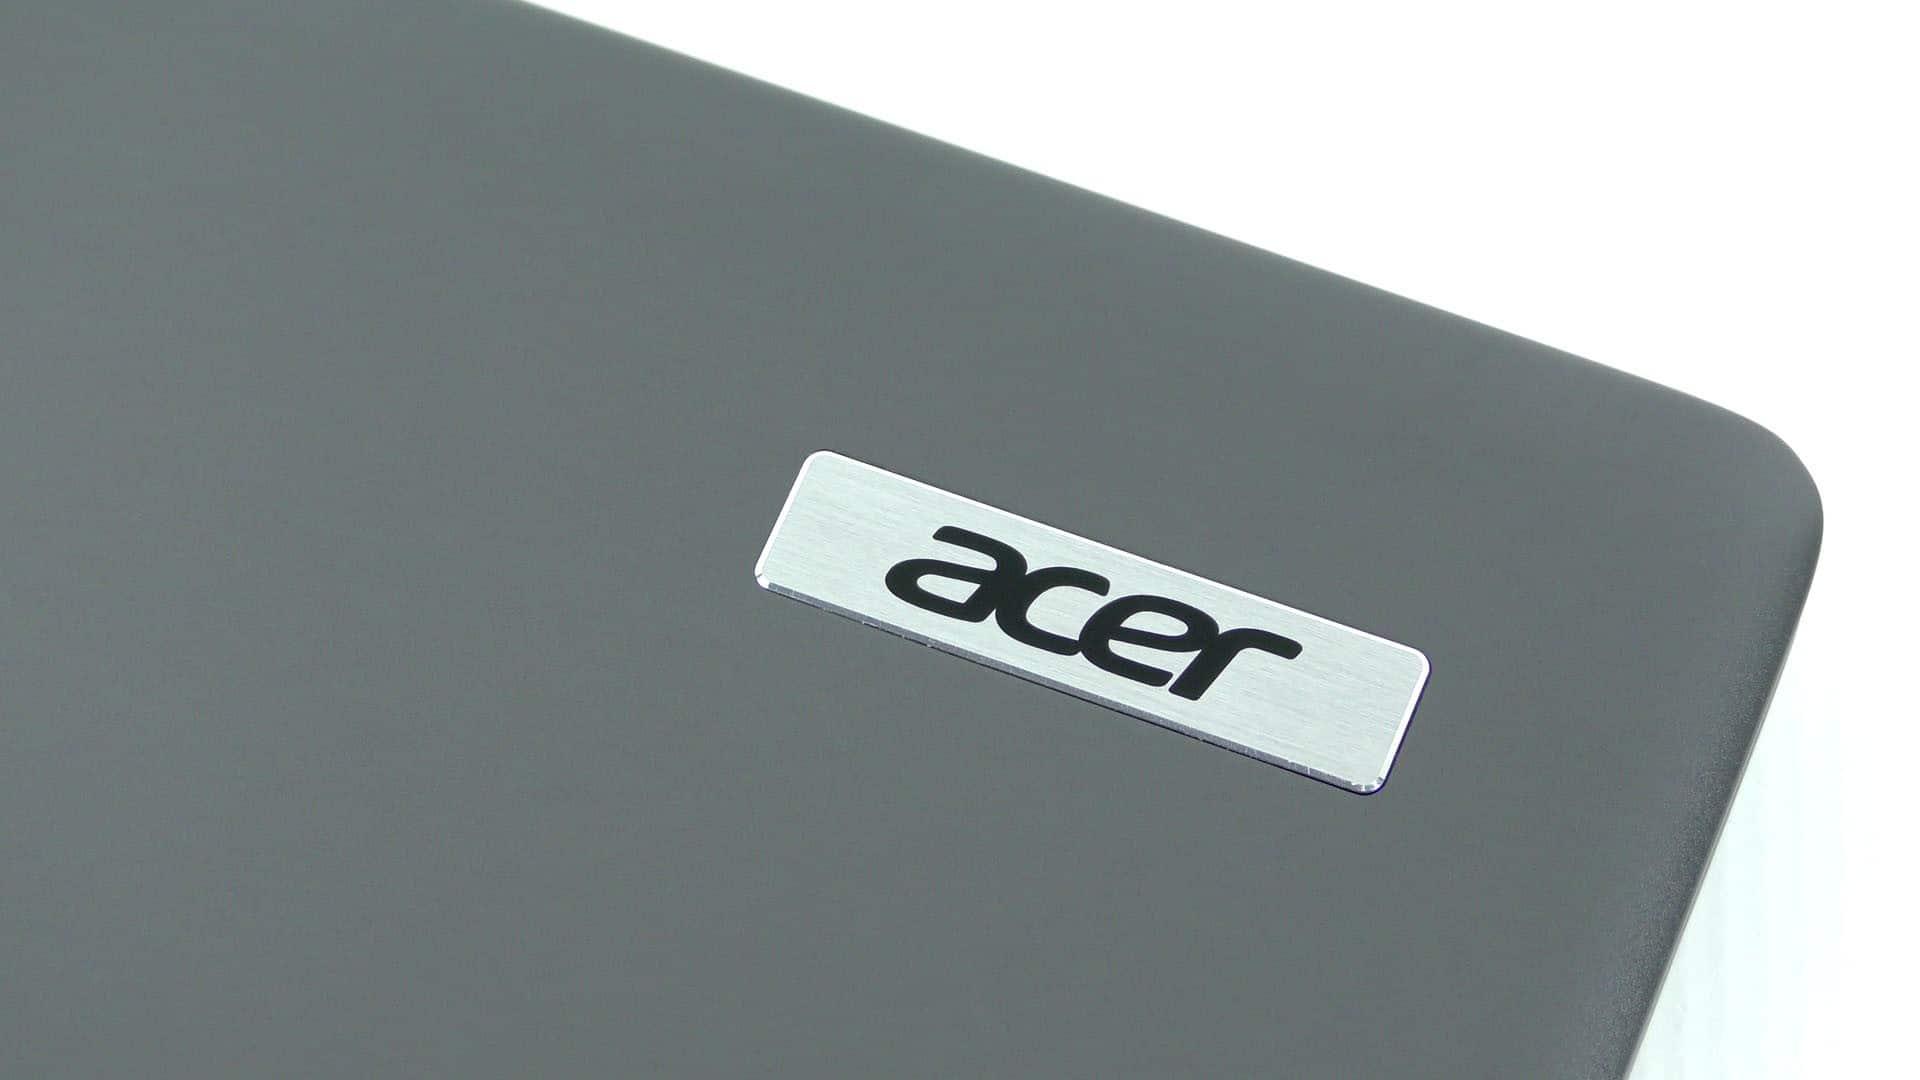 Acer TravelMate X349 - cała obudowa to aluminium